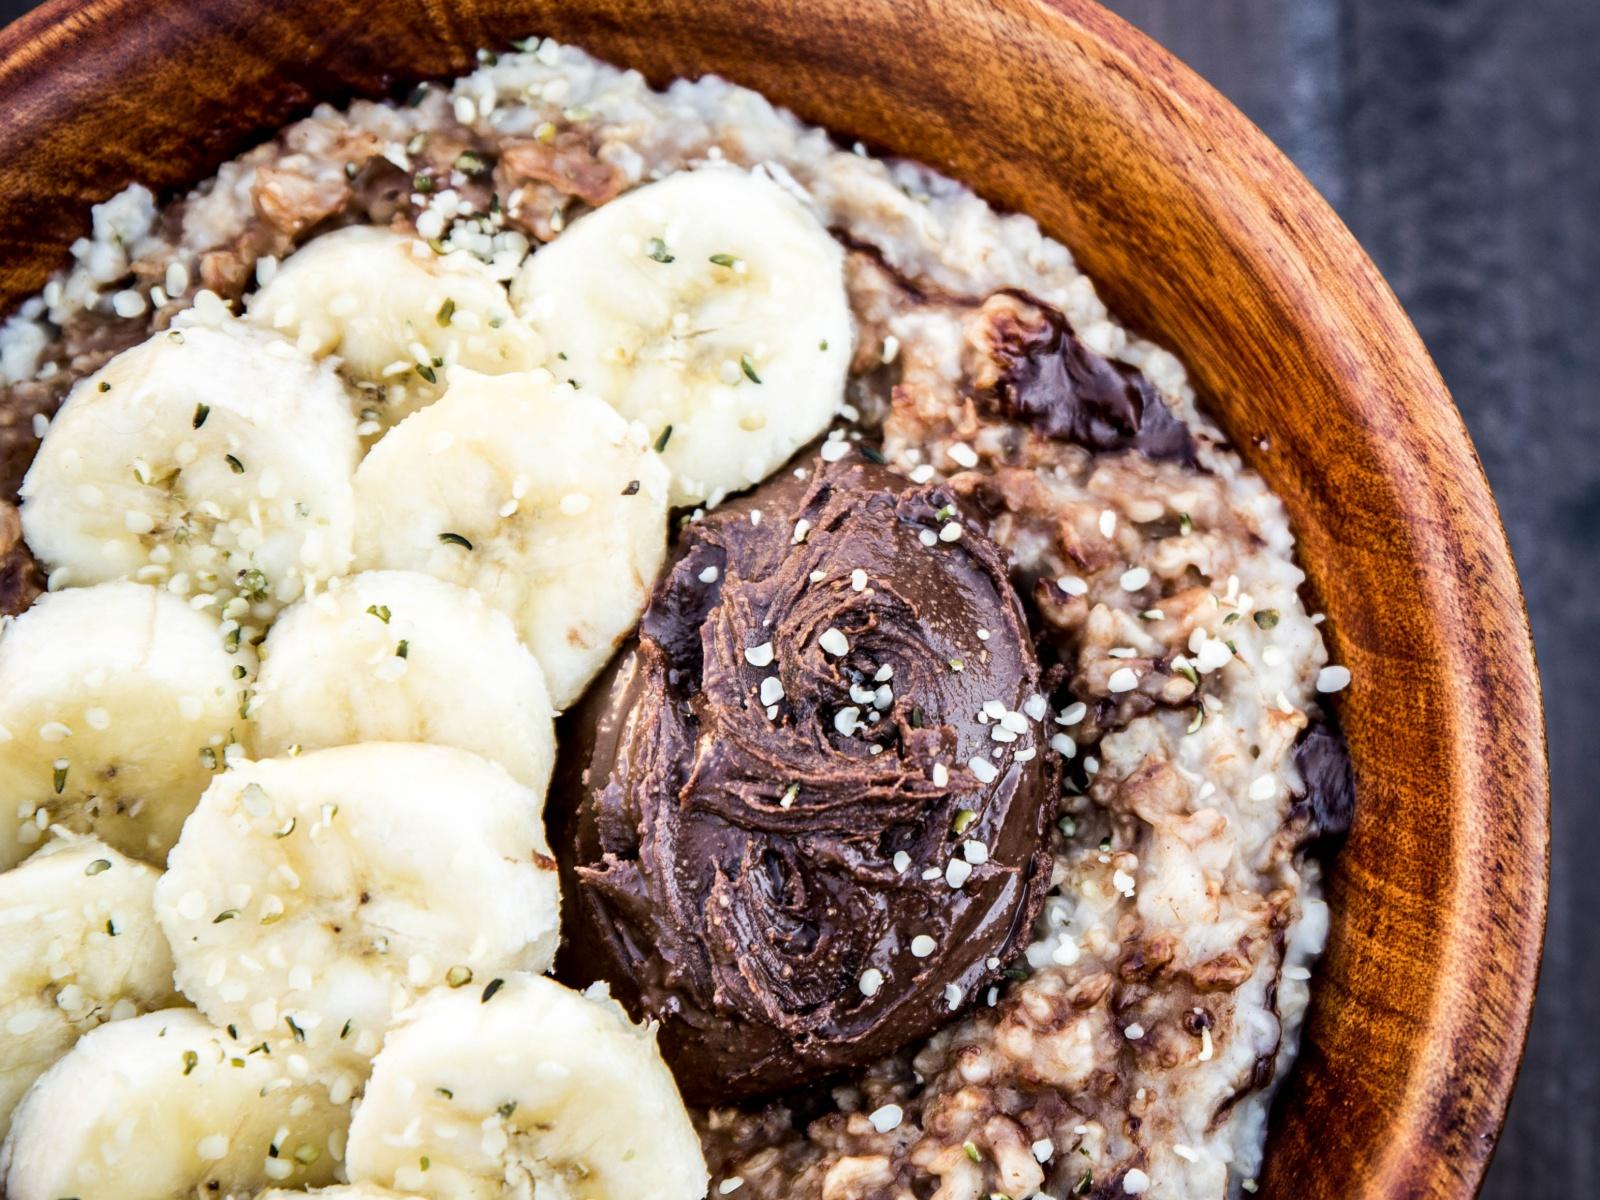 Chocolate Peanut Butter Swirl Protein Oatmeal